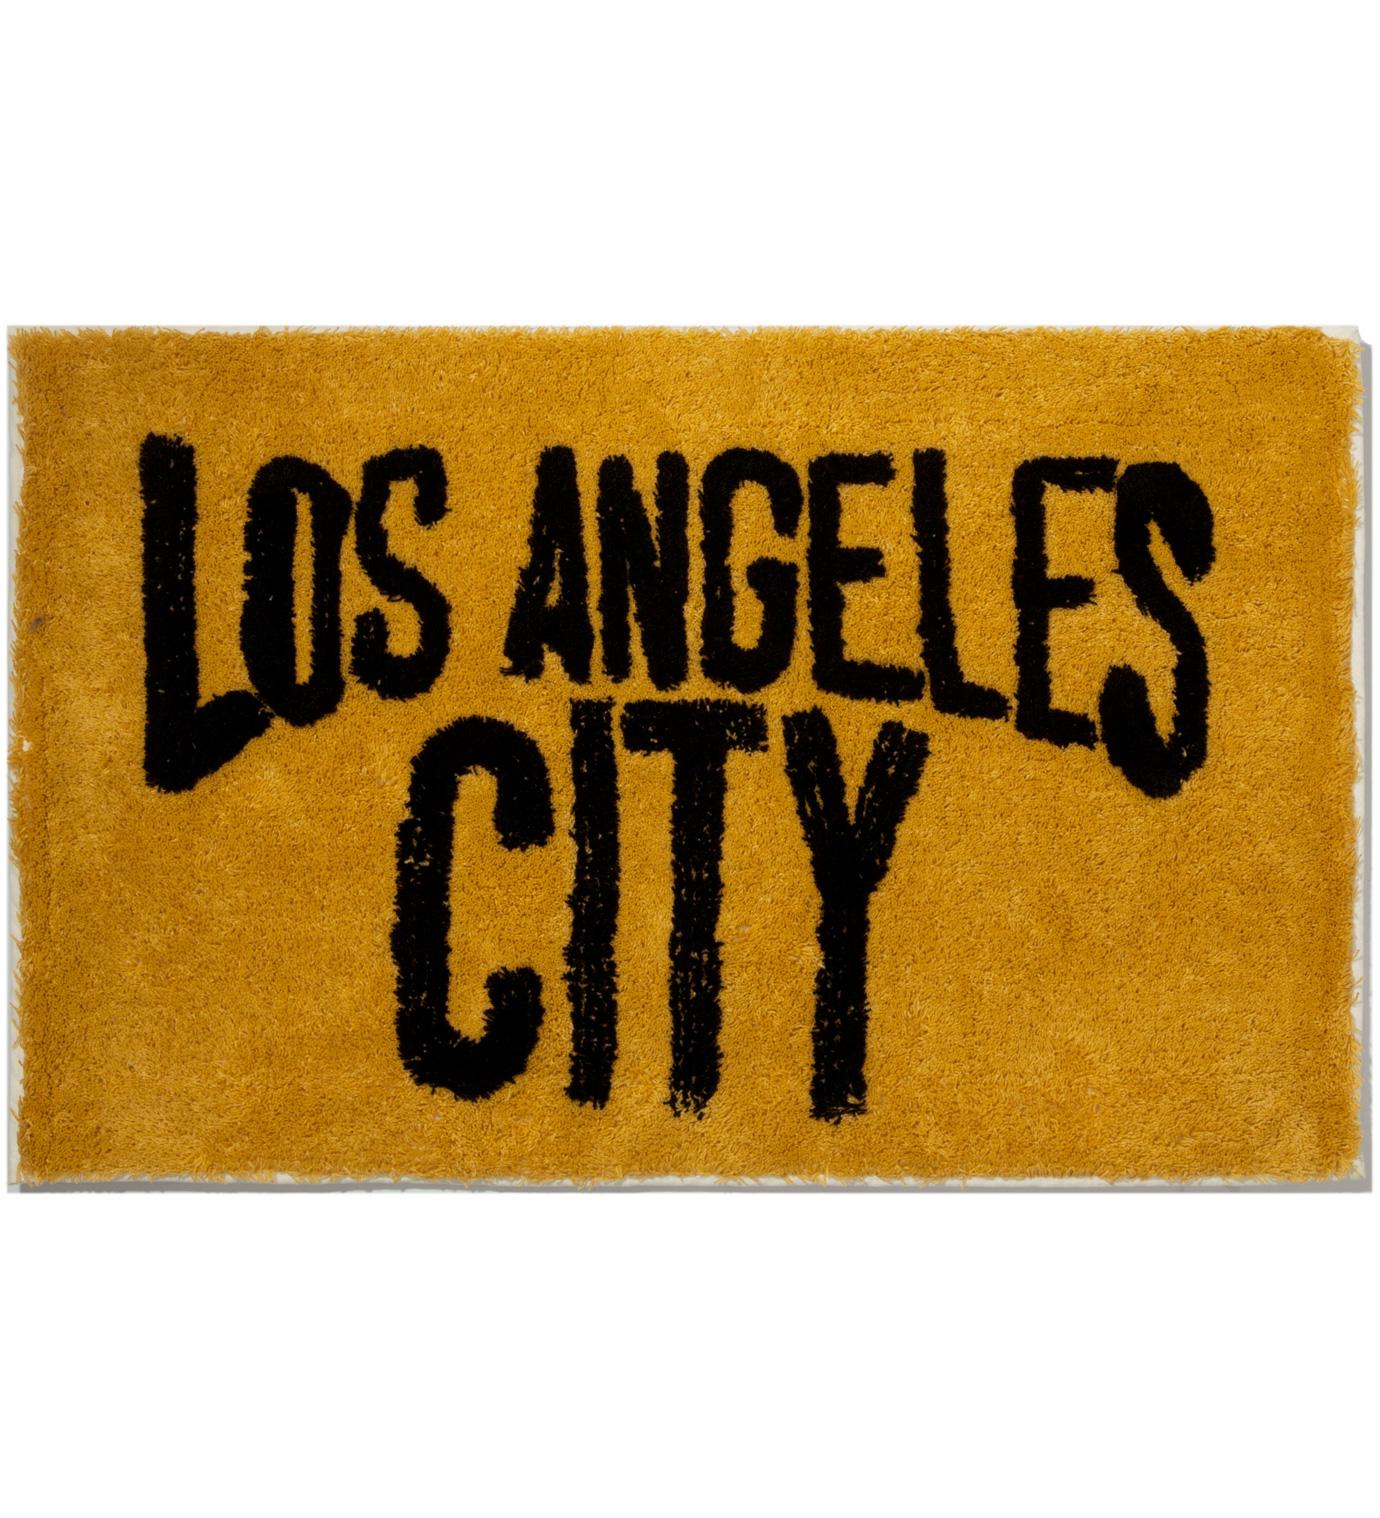 SECOND LAB Mustard Los Angeles City Rug